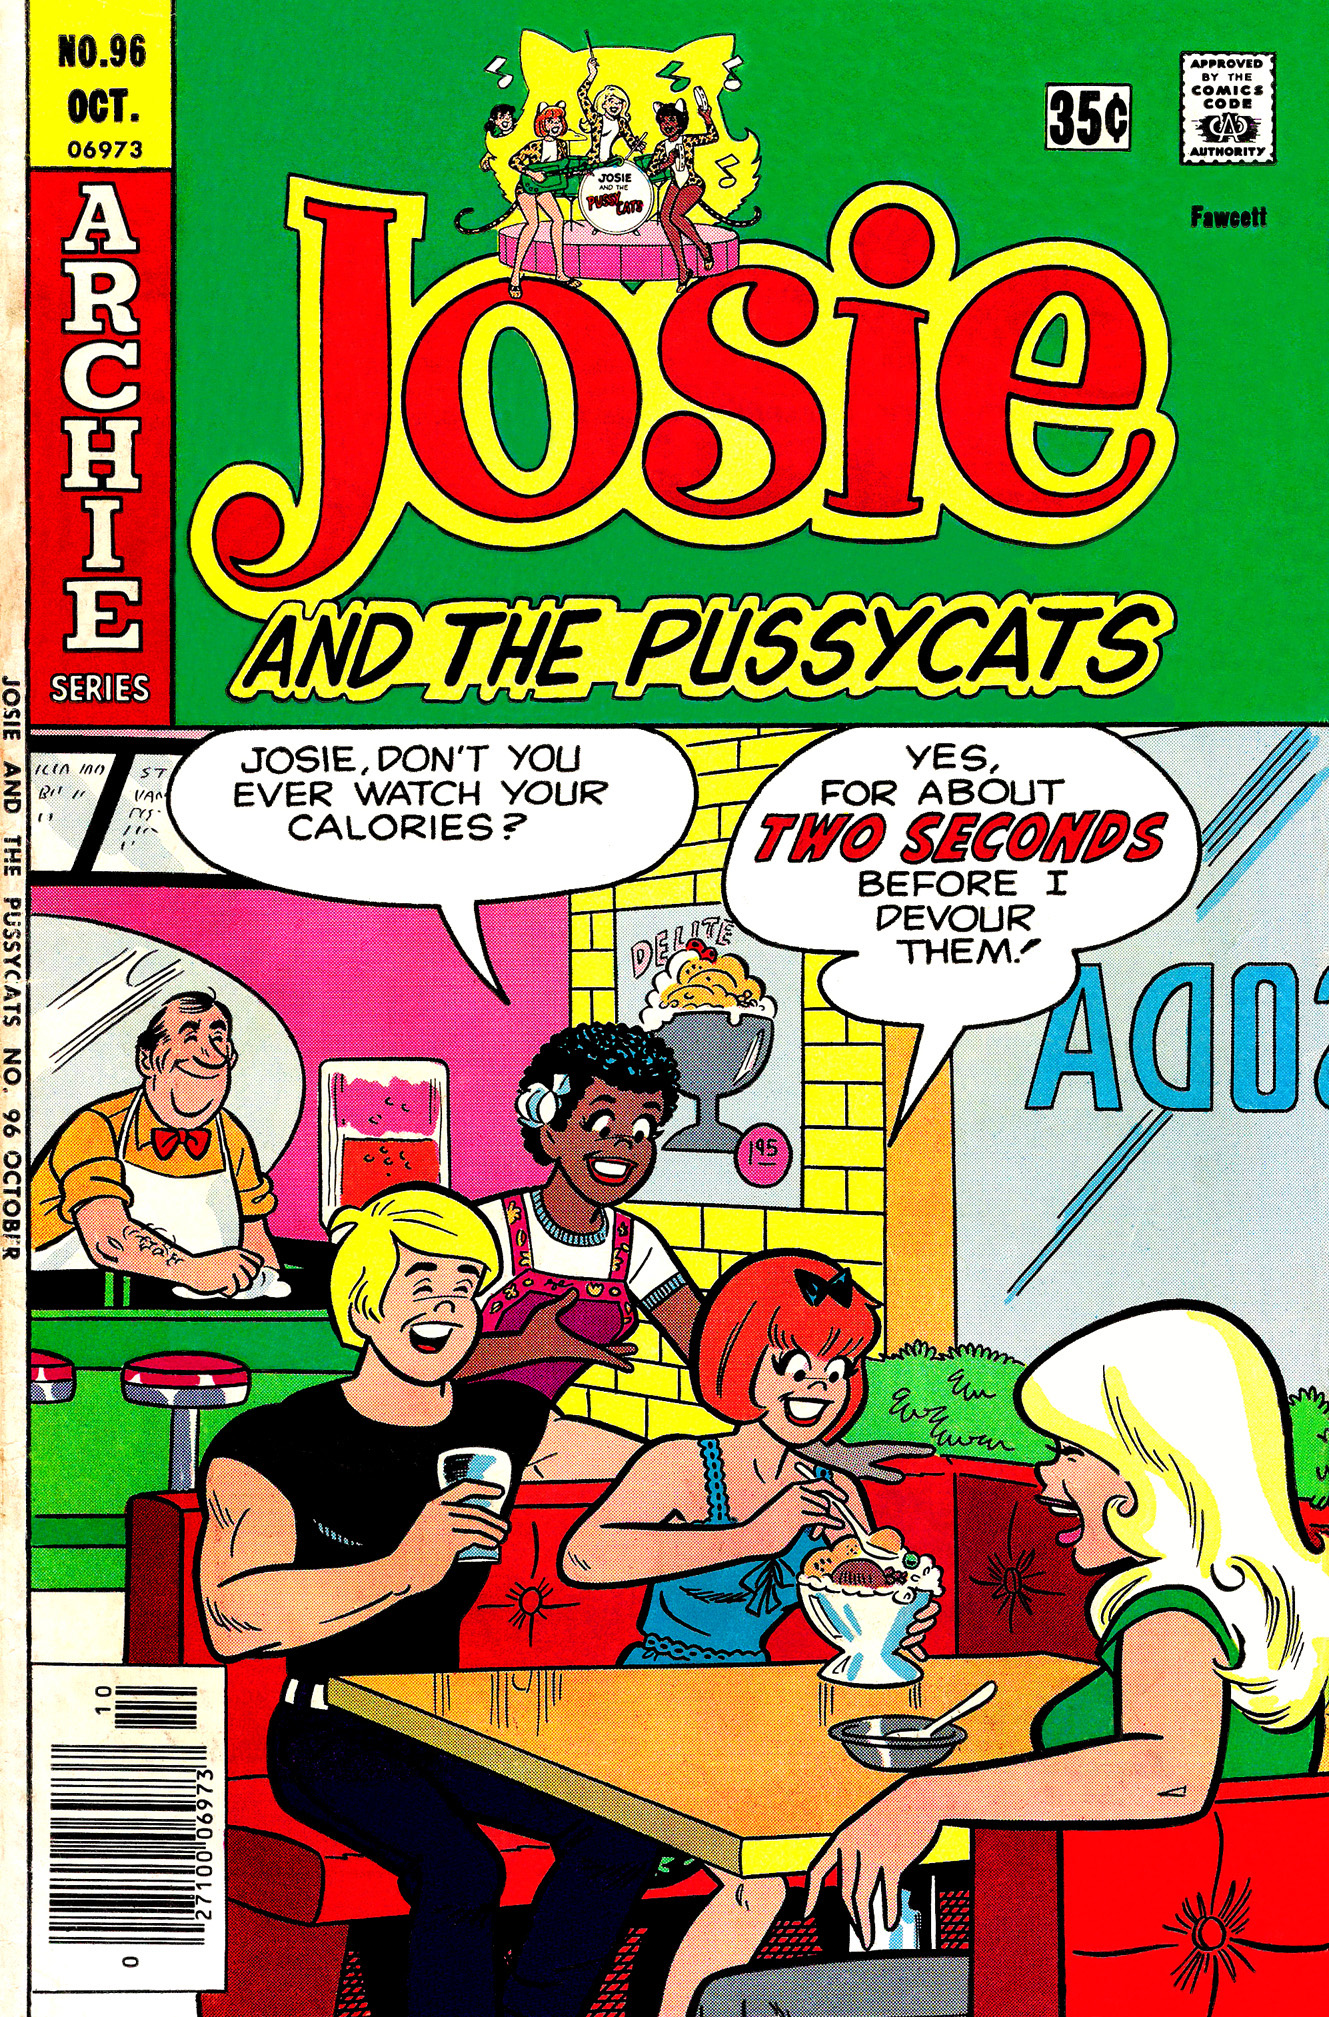 Read online She's Josie comic -  Issue #96 - 1